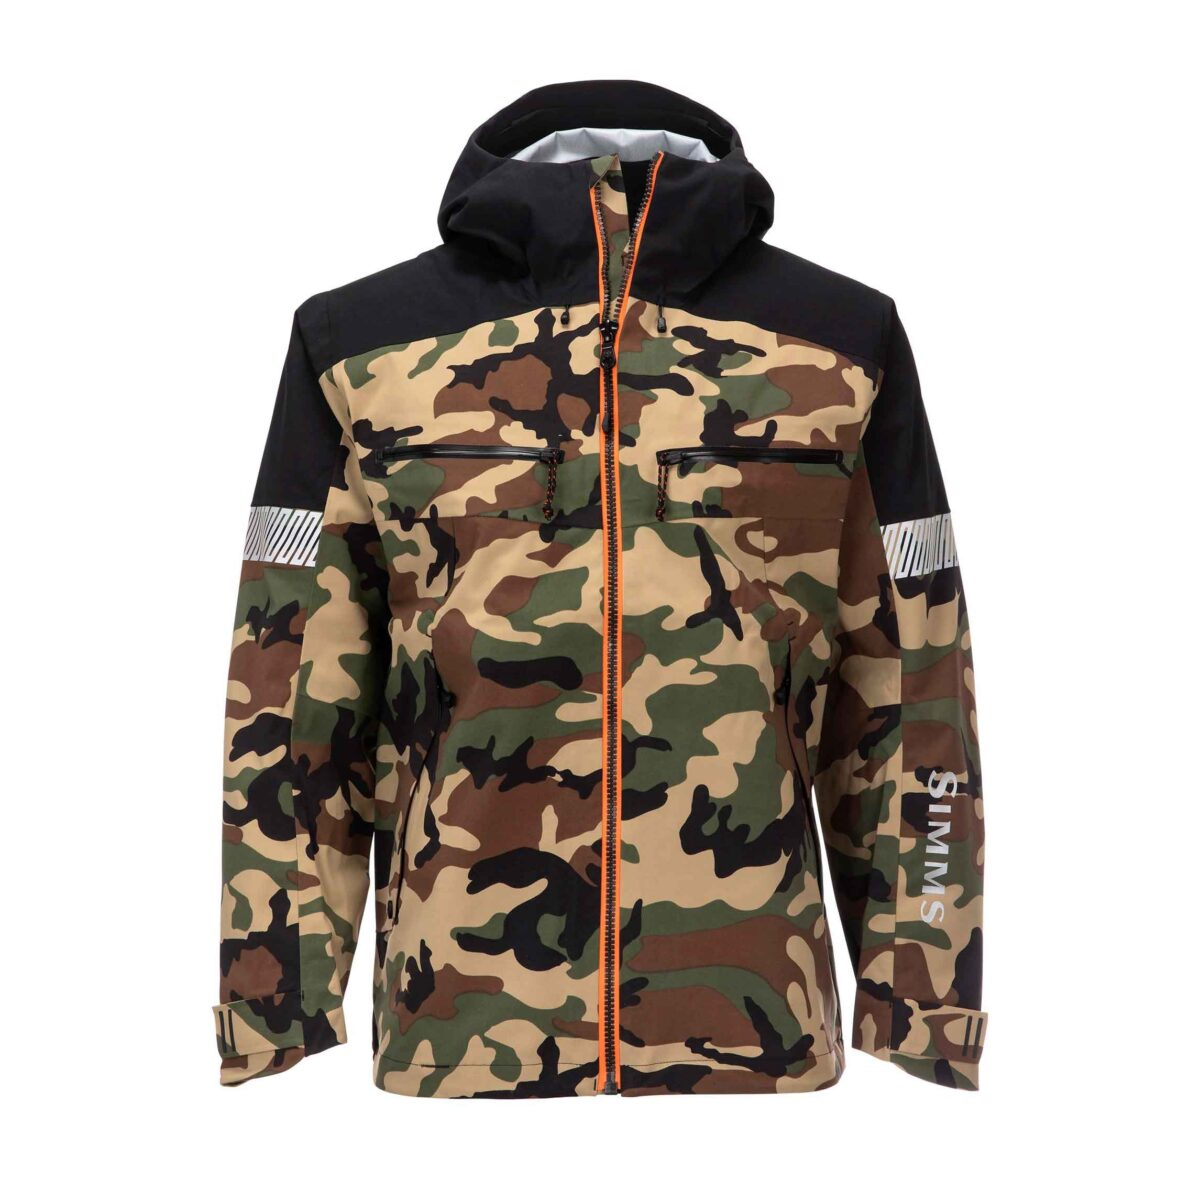 Chaqueta Simms CX Fishing Jacket